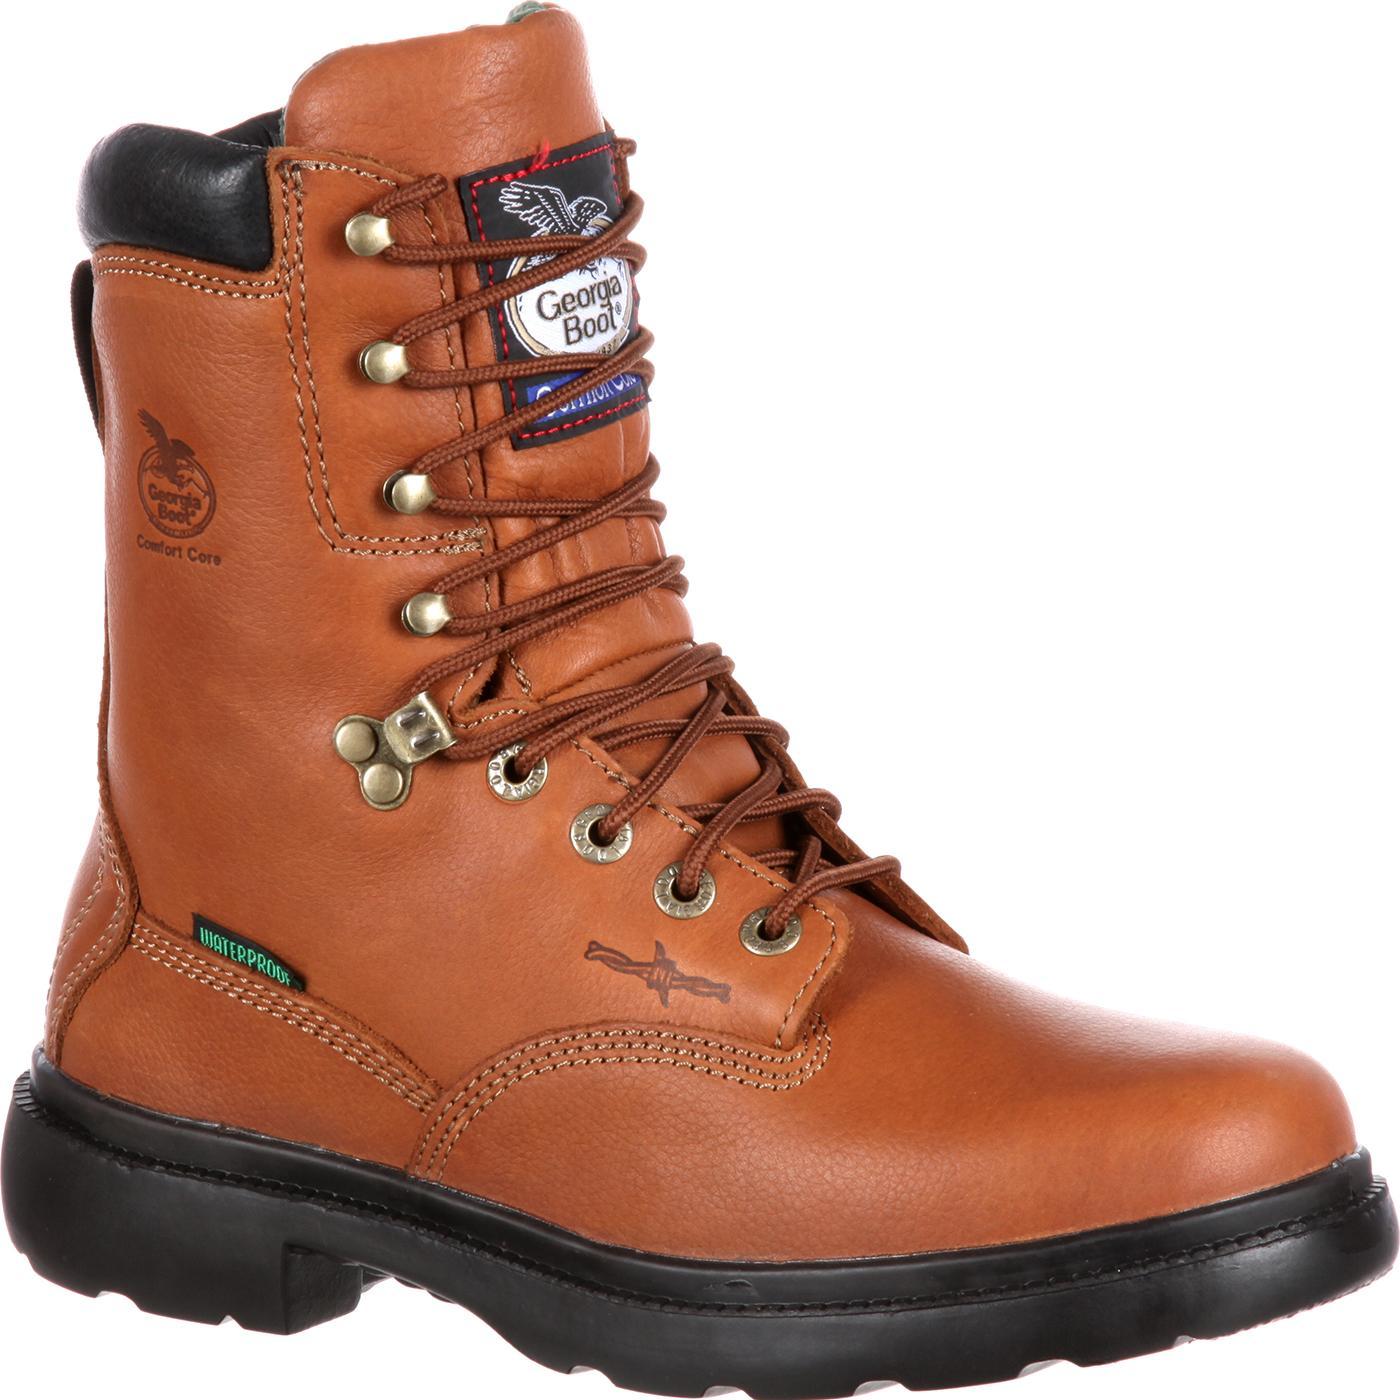 d0977701500 Georgia Boot Waterproof Farm & Ranch Work Boot